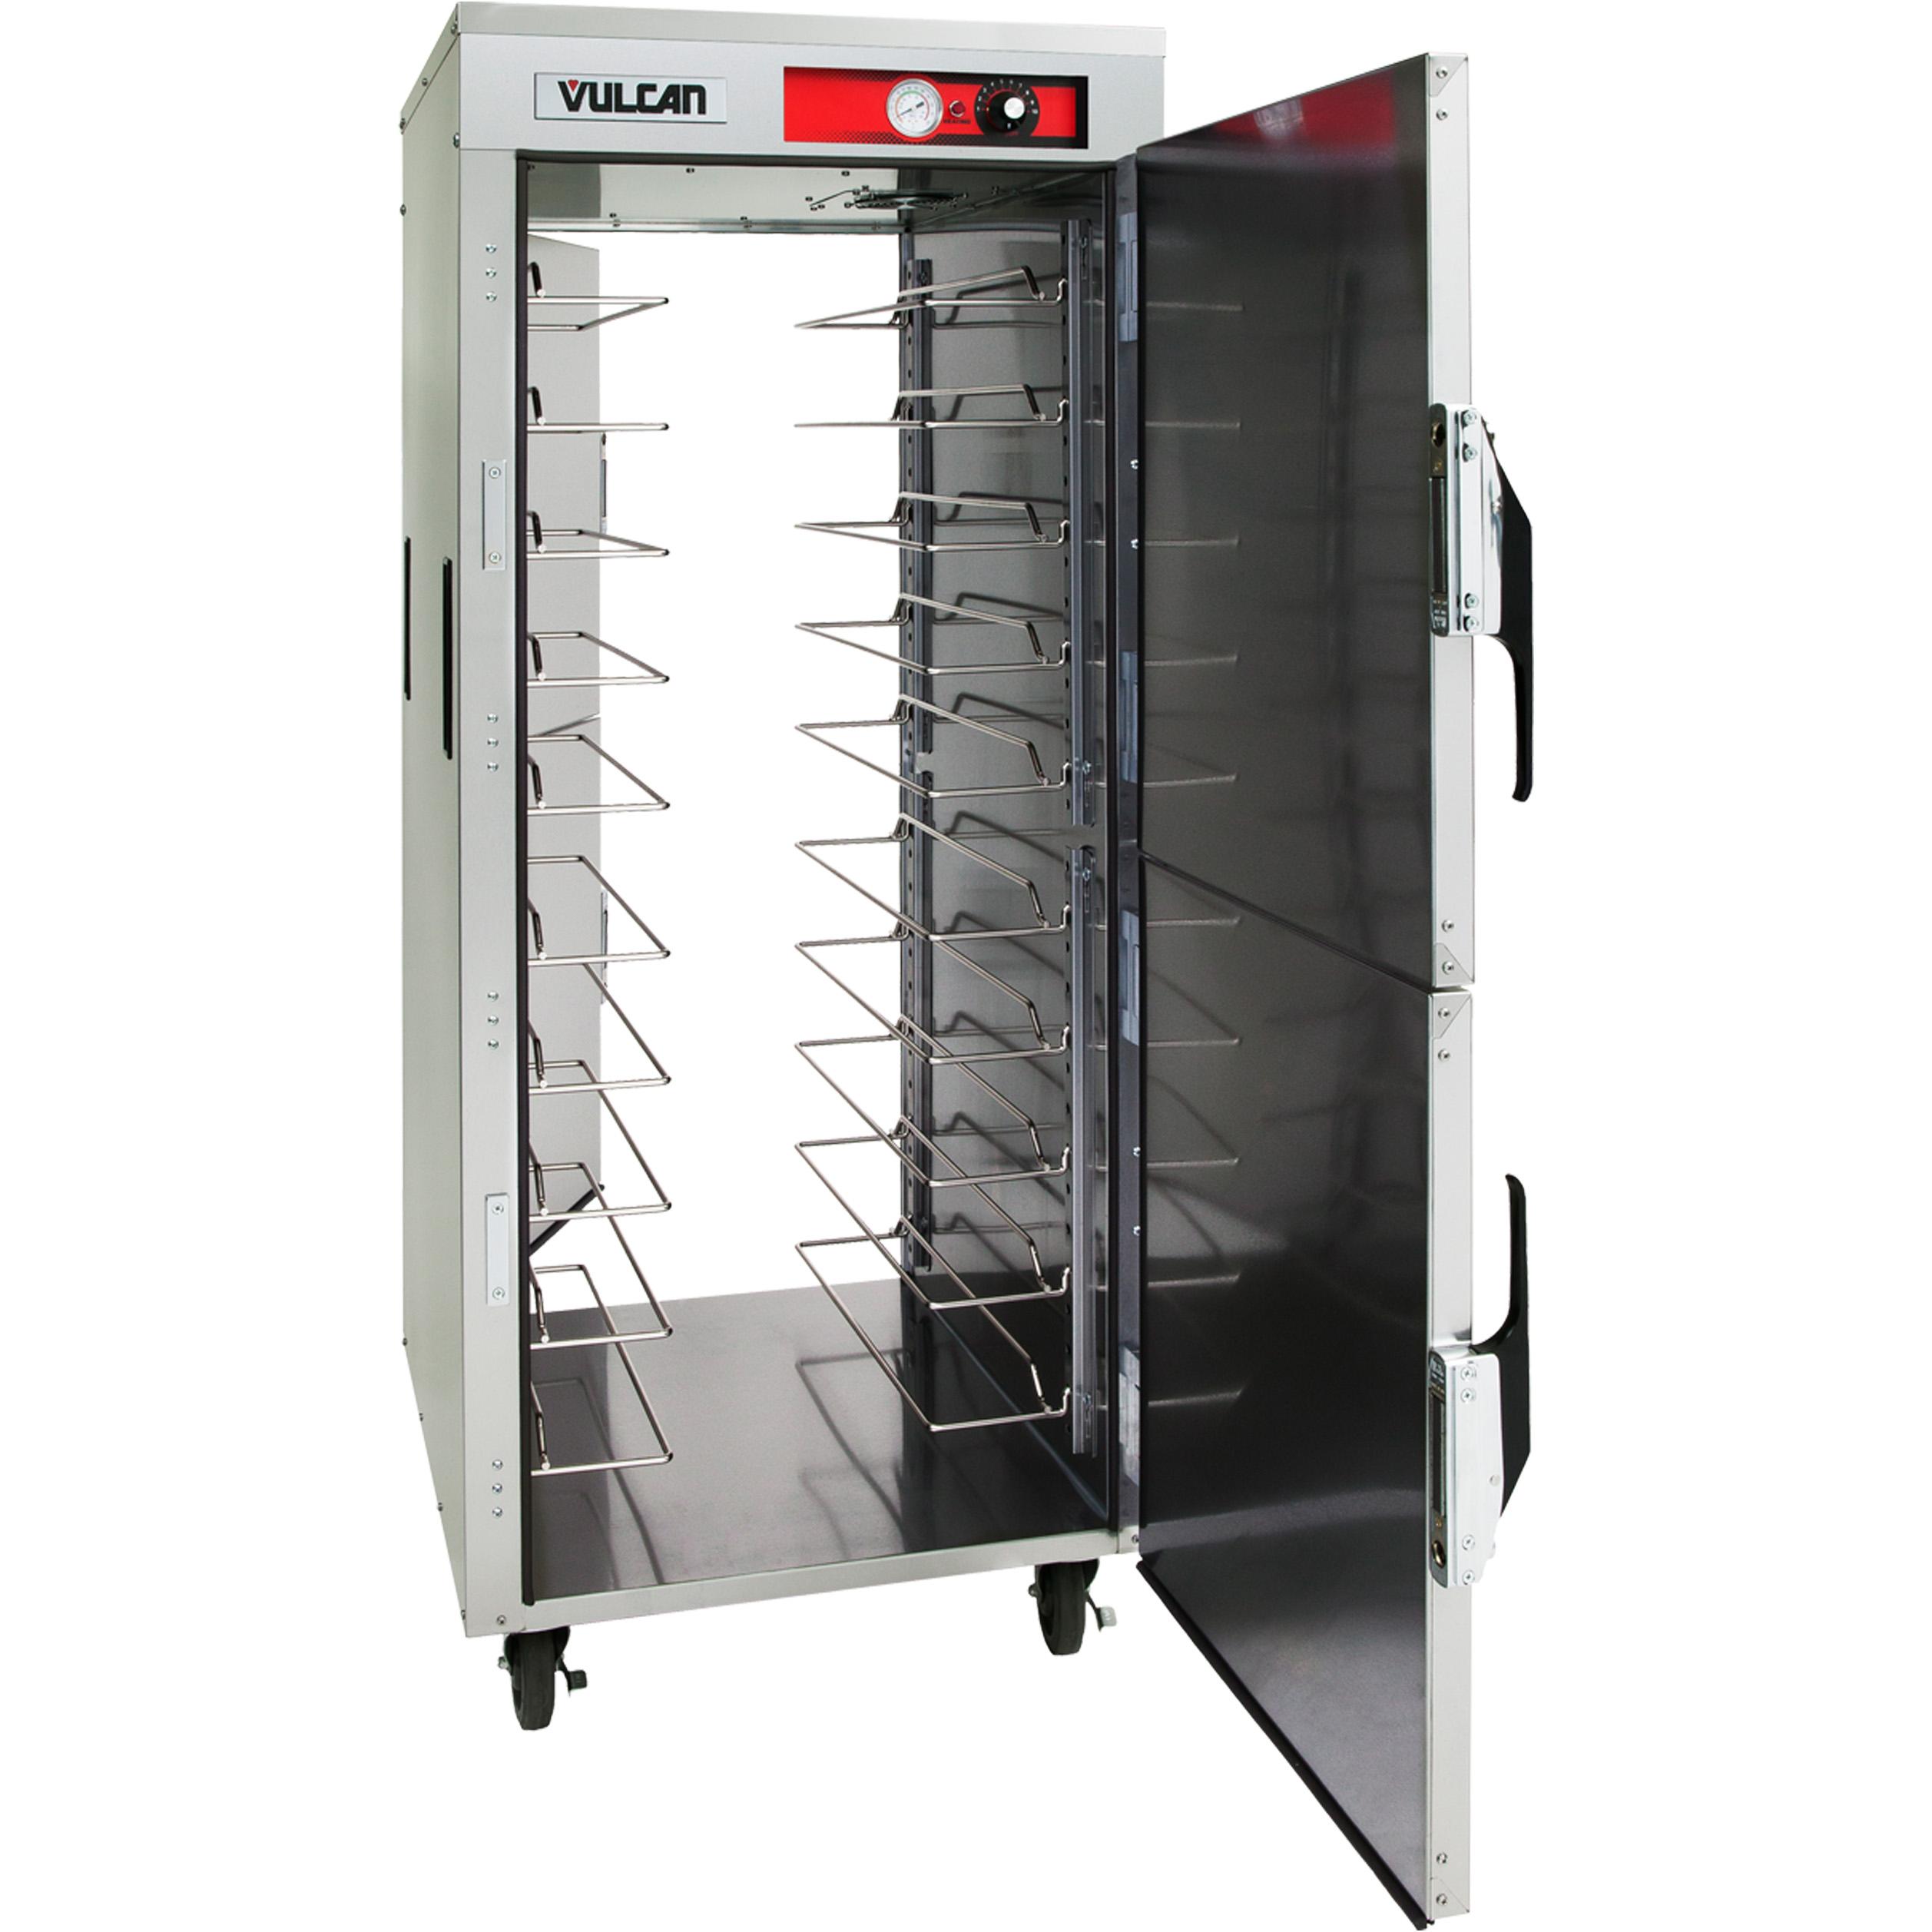 Vulcan VPT15SL heated cabinet, mobile, pass-thru